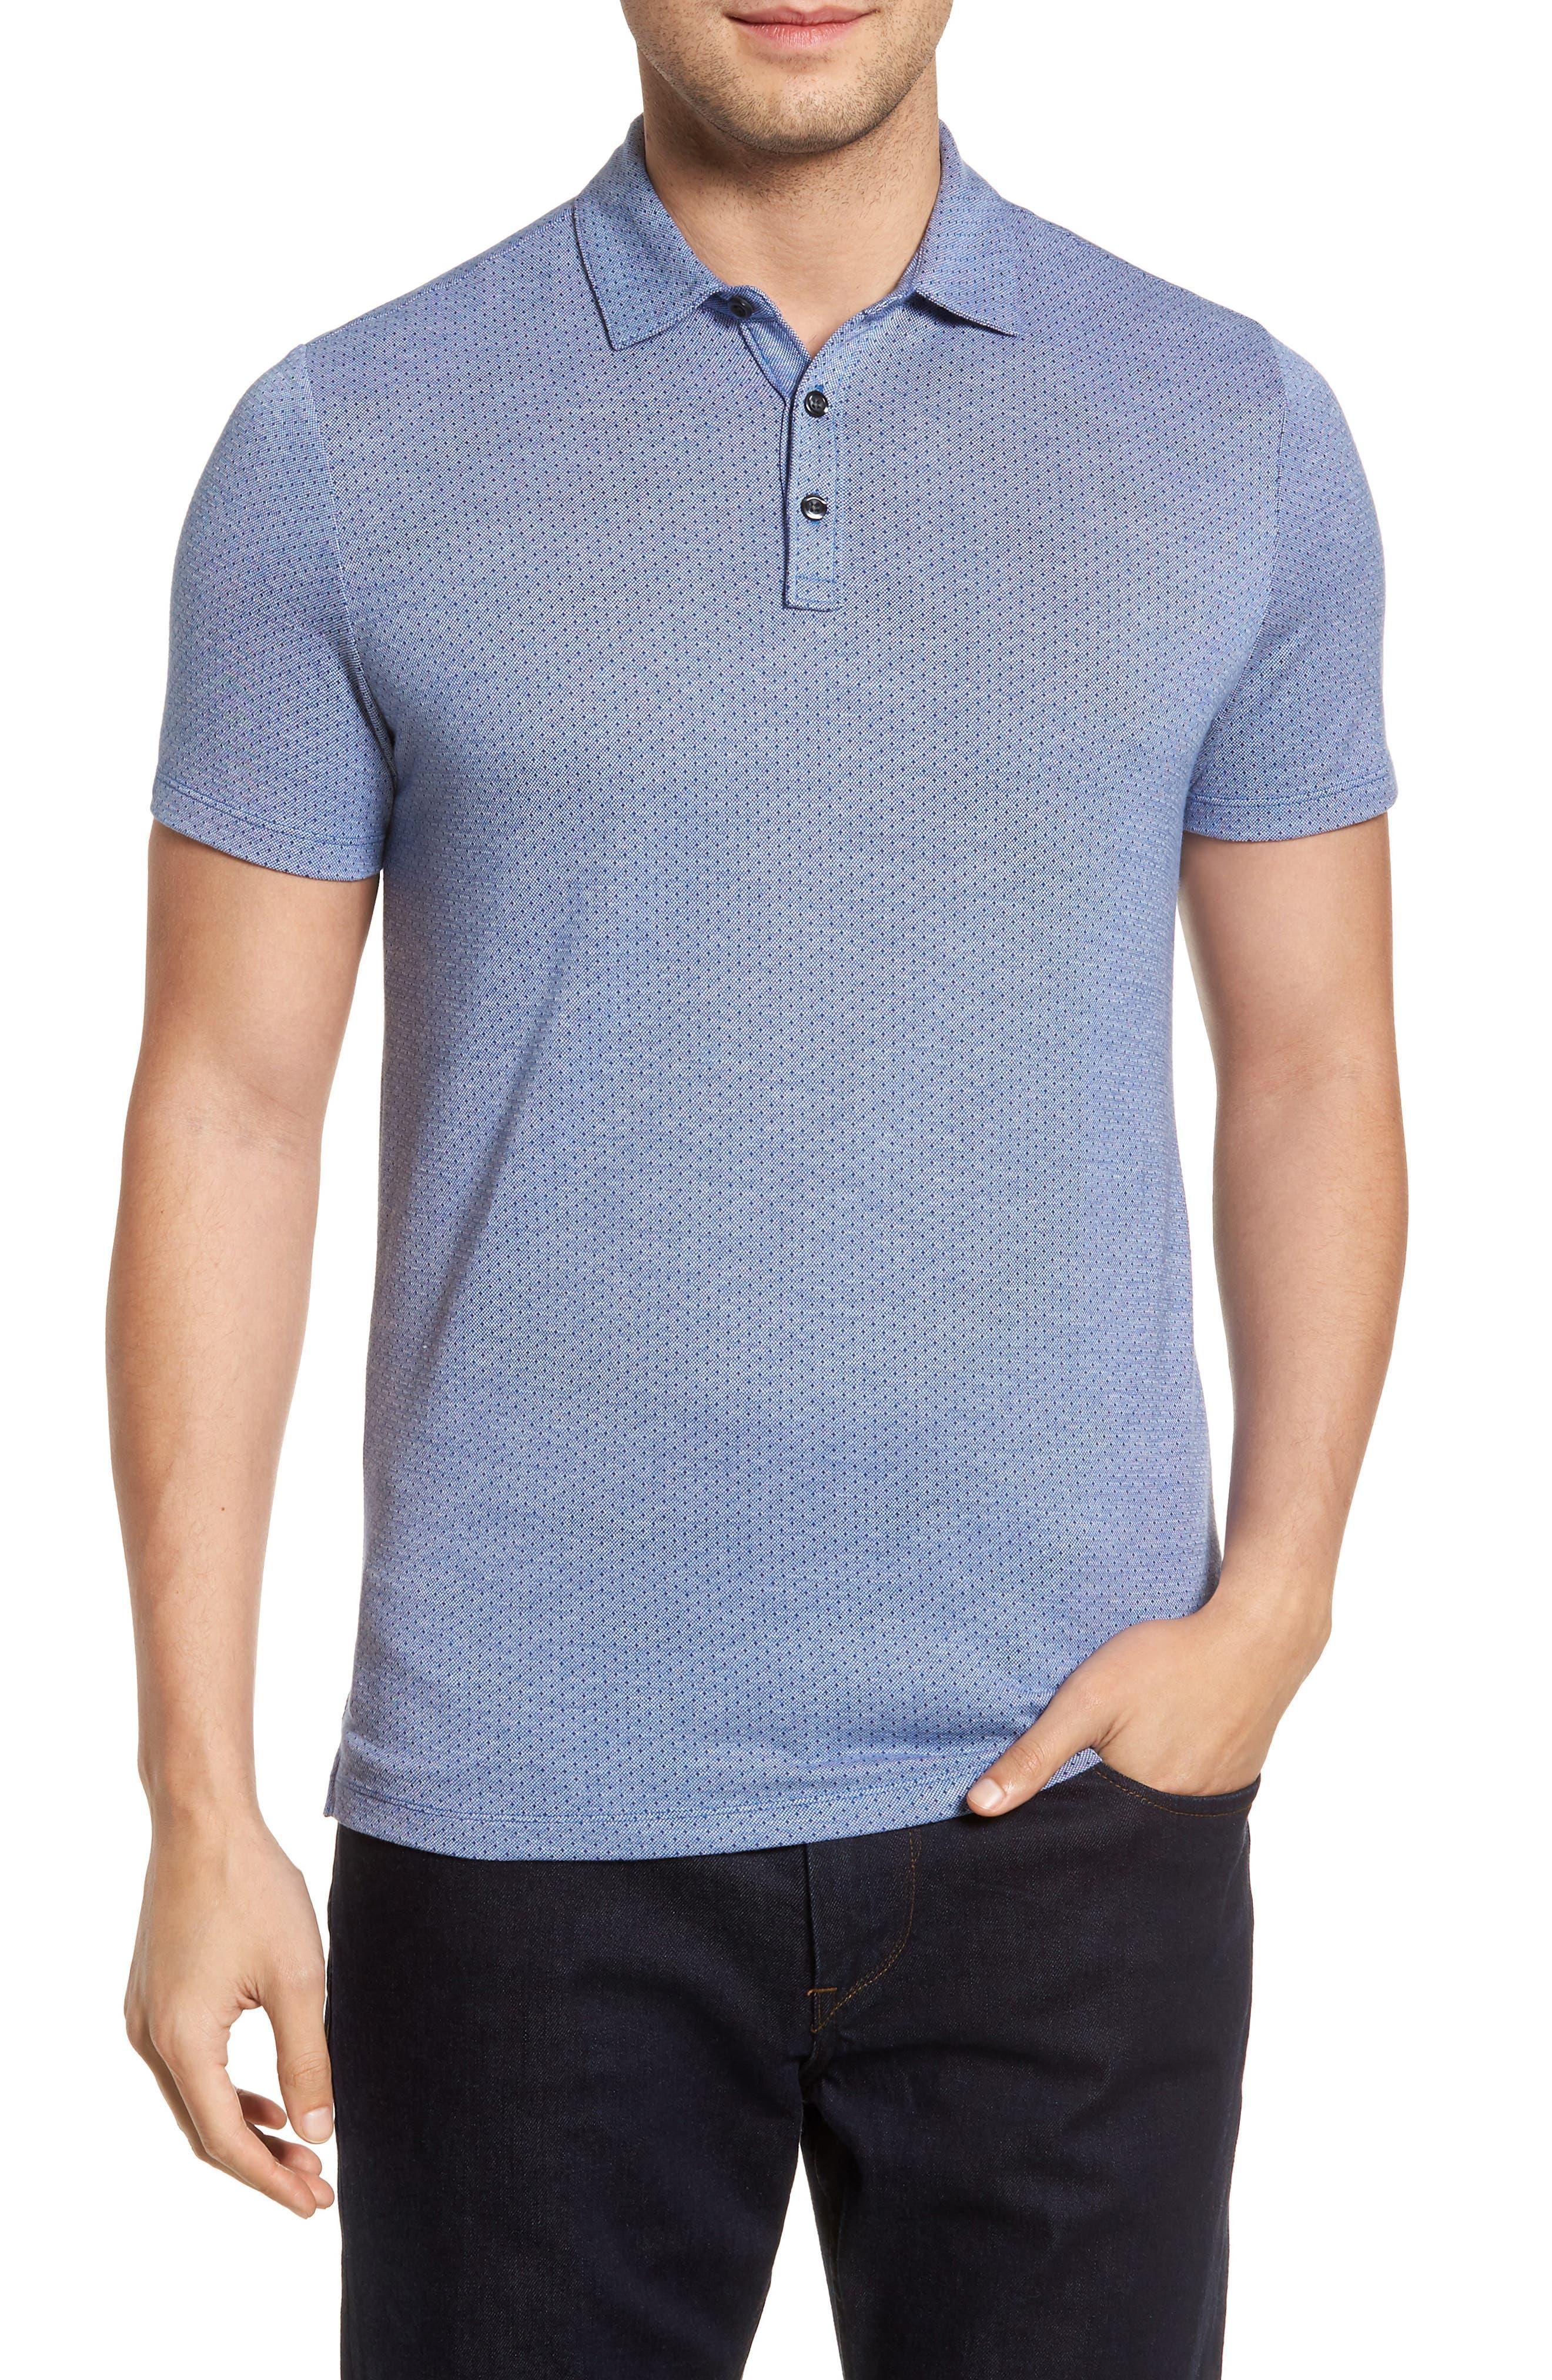 Main Image - Robert Barakett Johnson Sport Shirt